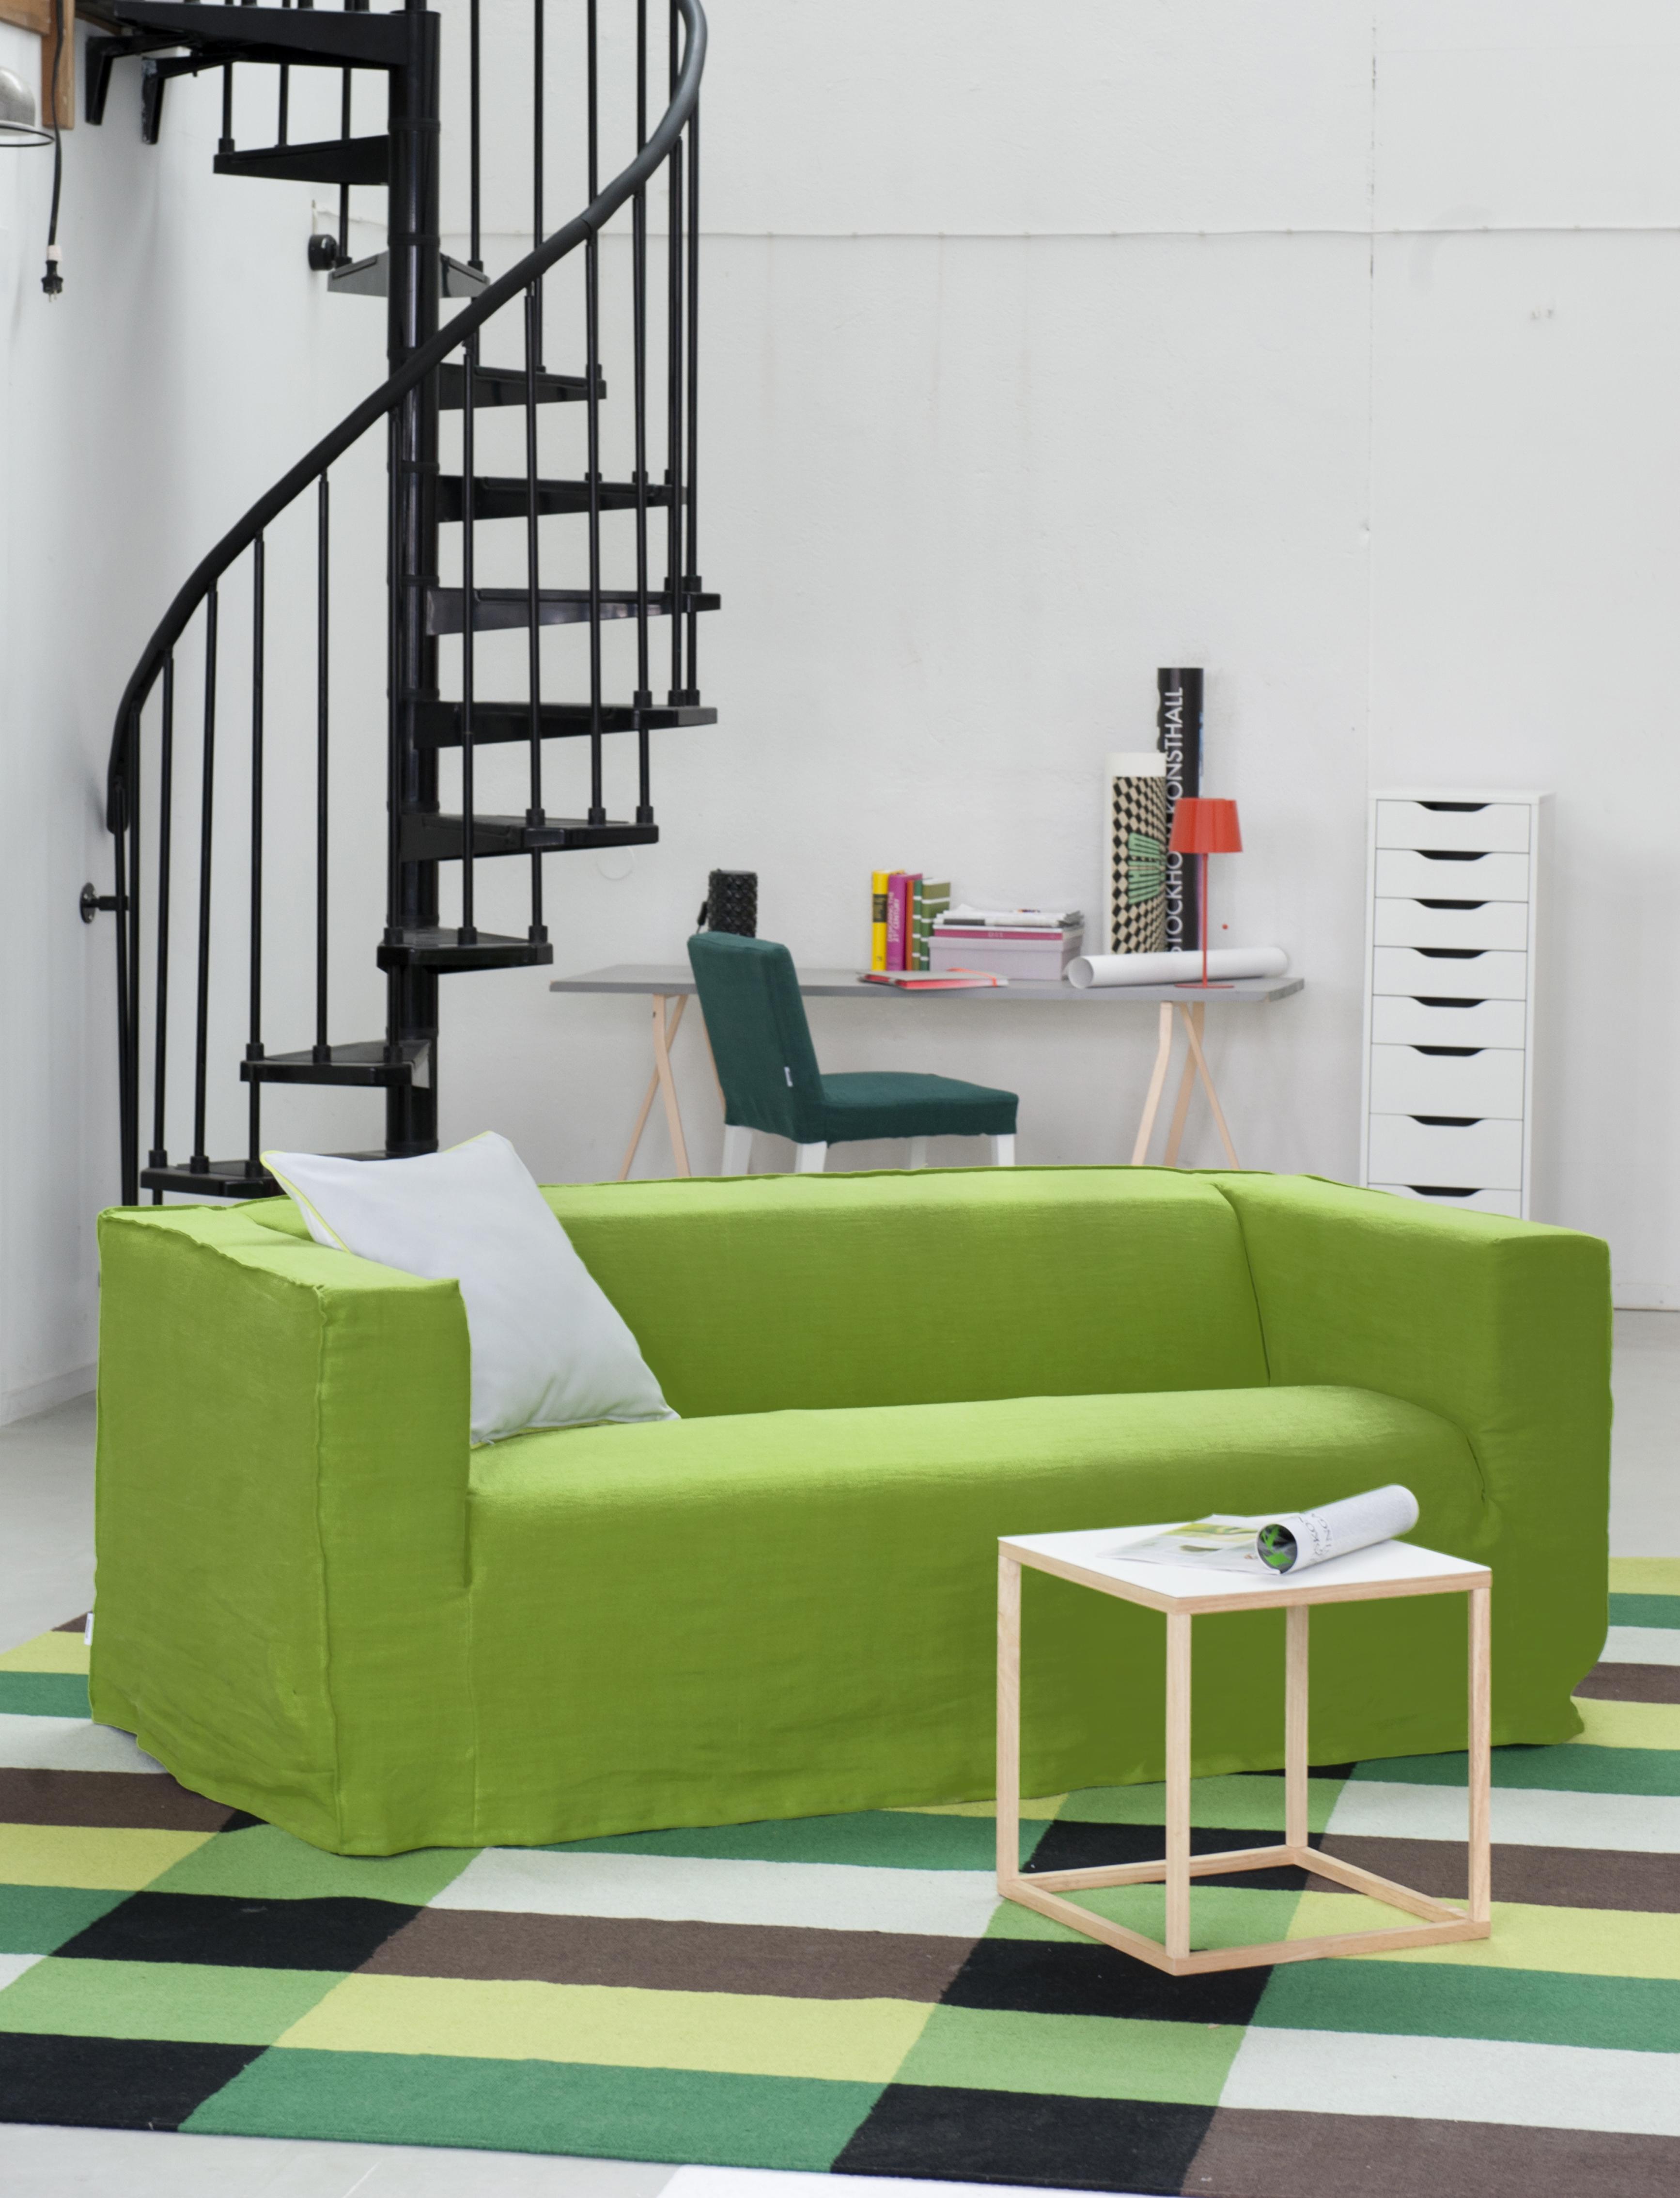 Ikea Klippan Brera Lino Leaf Bemz # Couleur Ikea